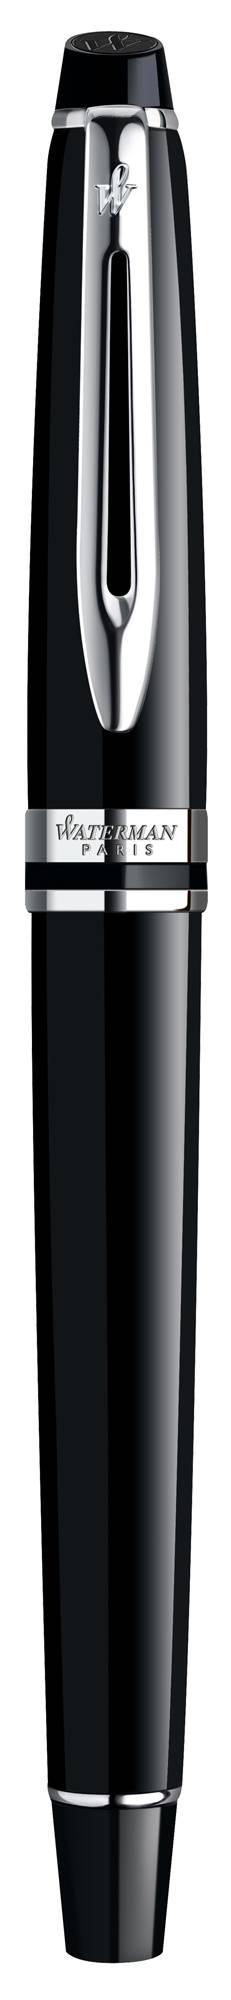 Ручка перьевая Waterman Expert 3 Black CT (S0951740) - фото 1